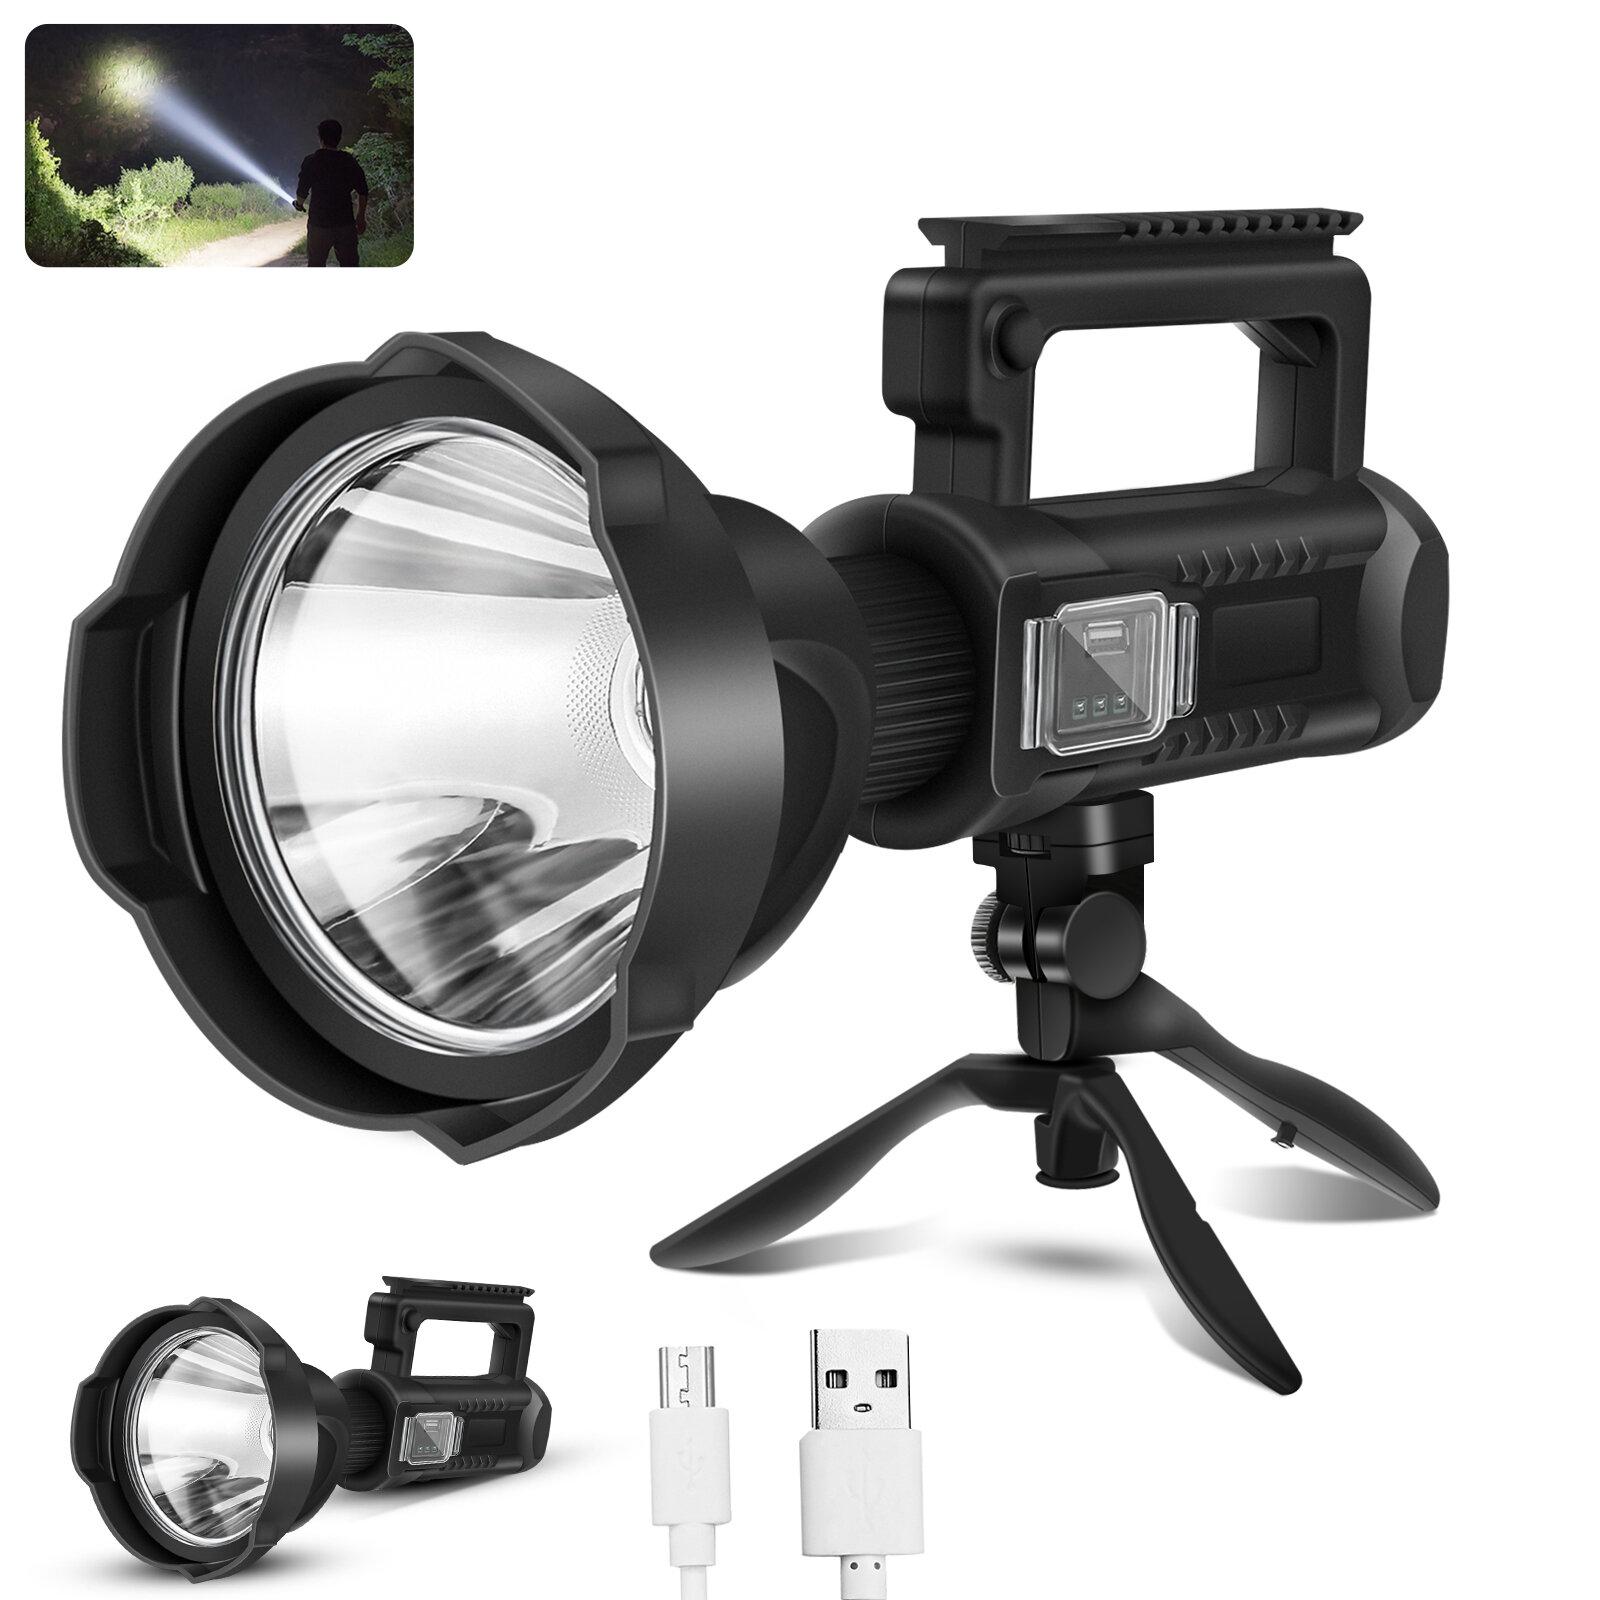 Latarka Rechargeable P70 Spotlight Flashlight za $21.88 / ~85zł